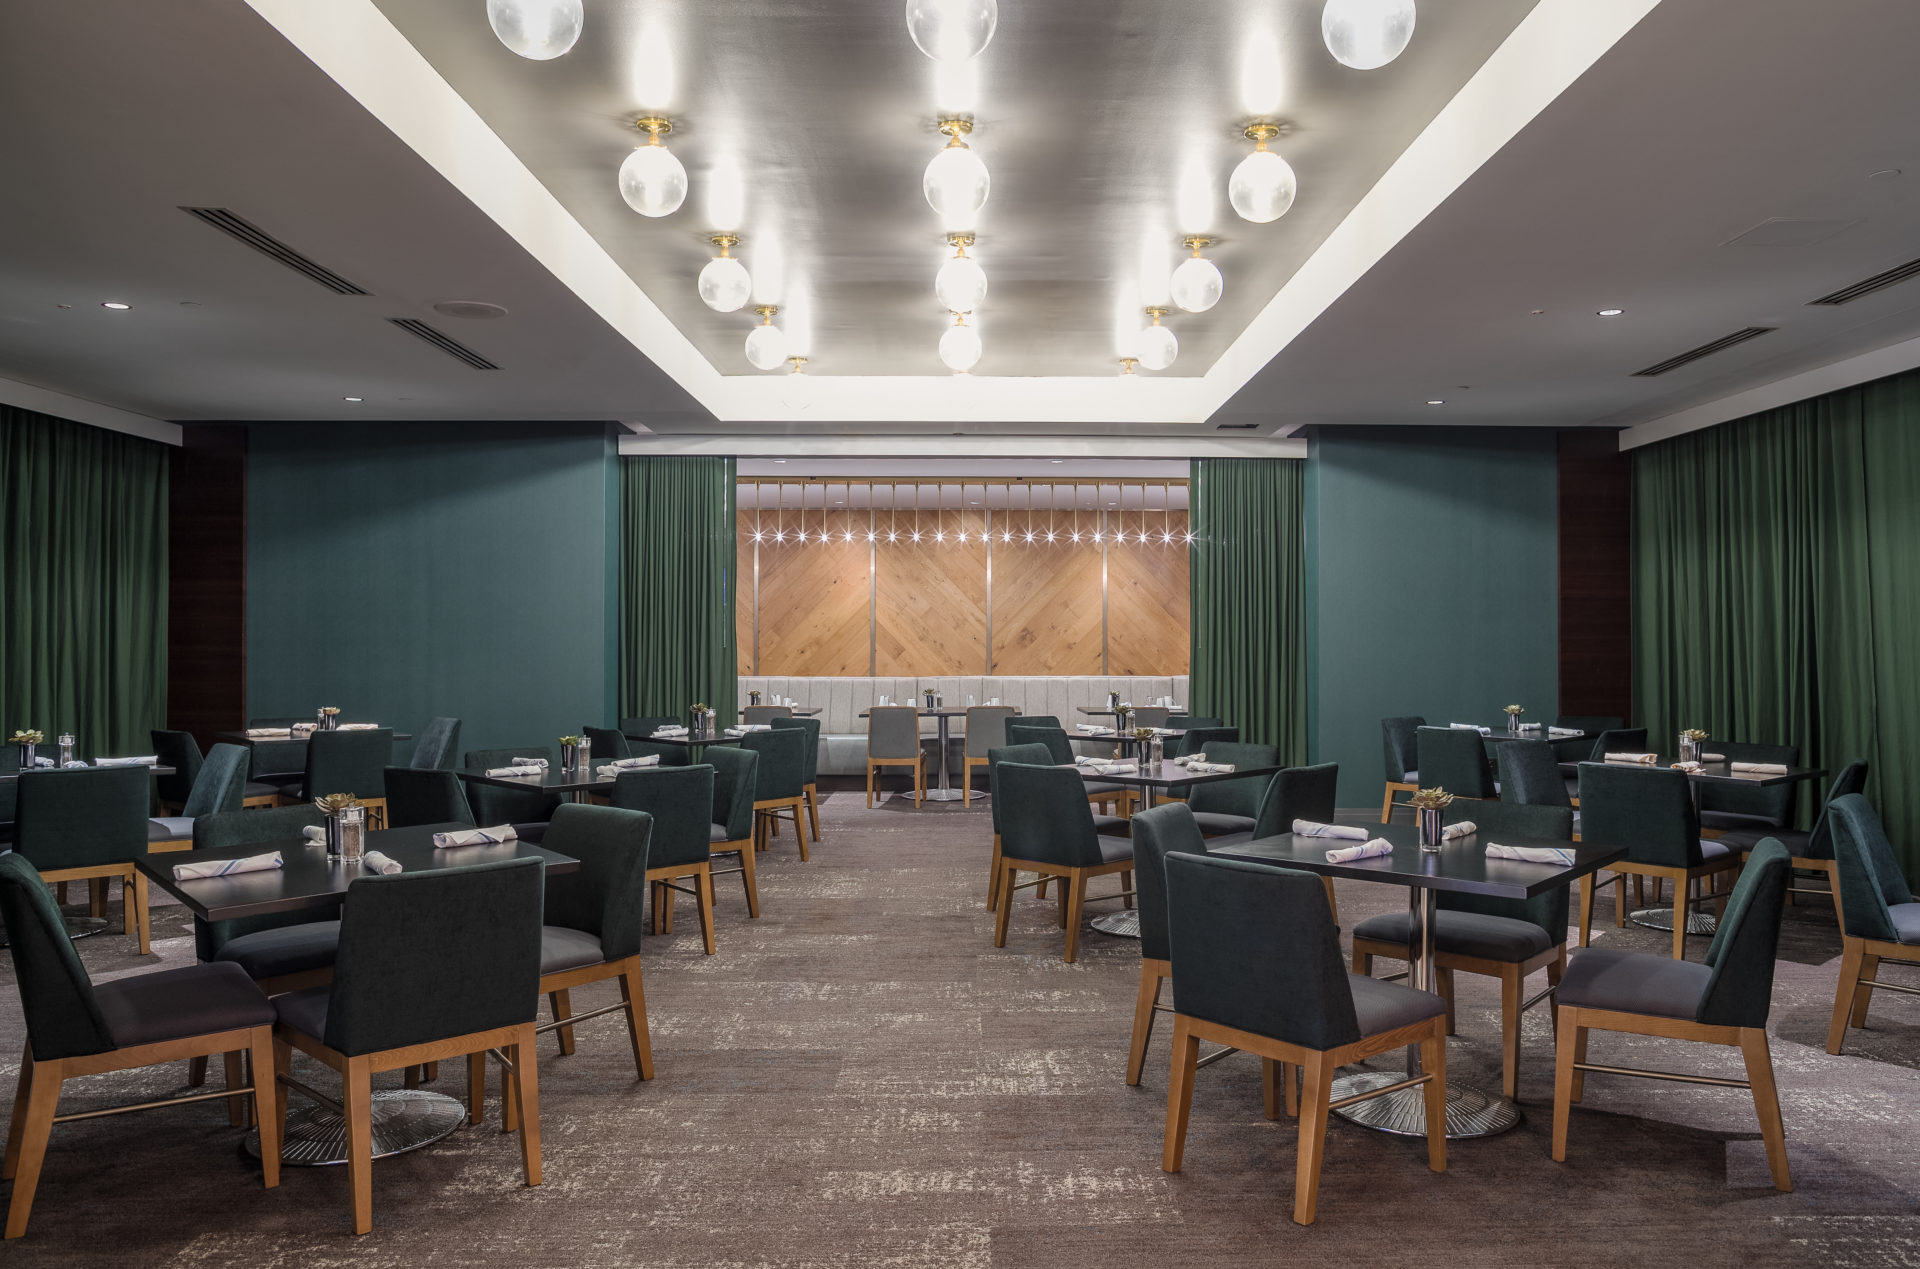 Hotel restaurant features wood-like tile floors